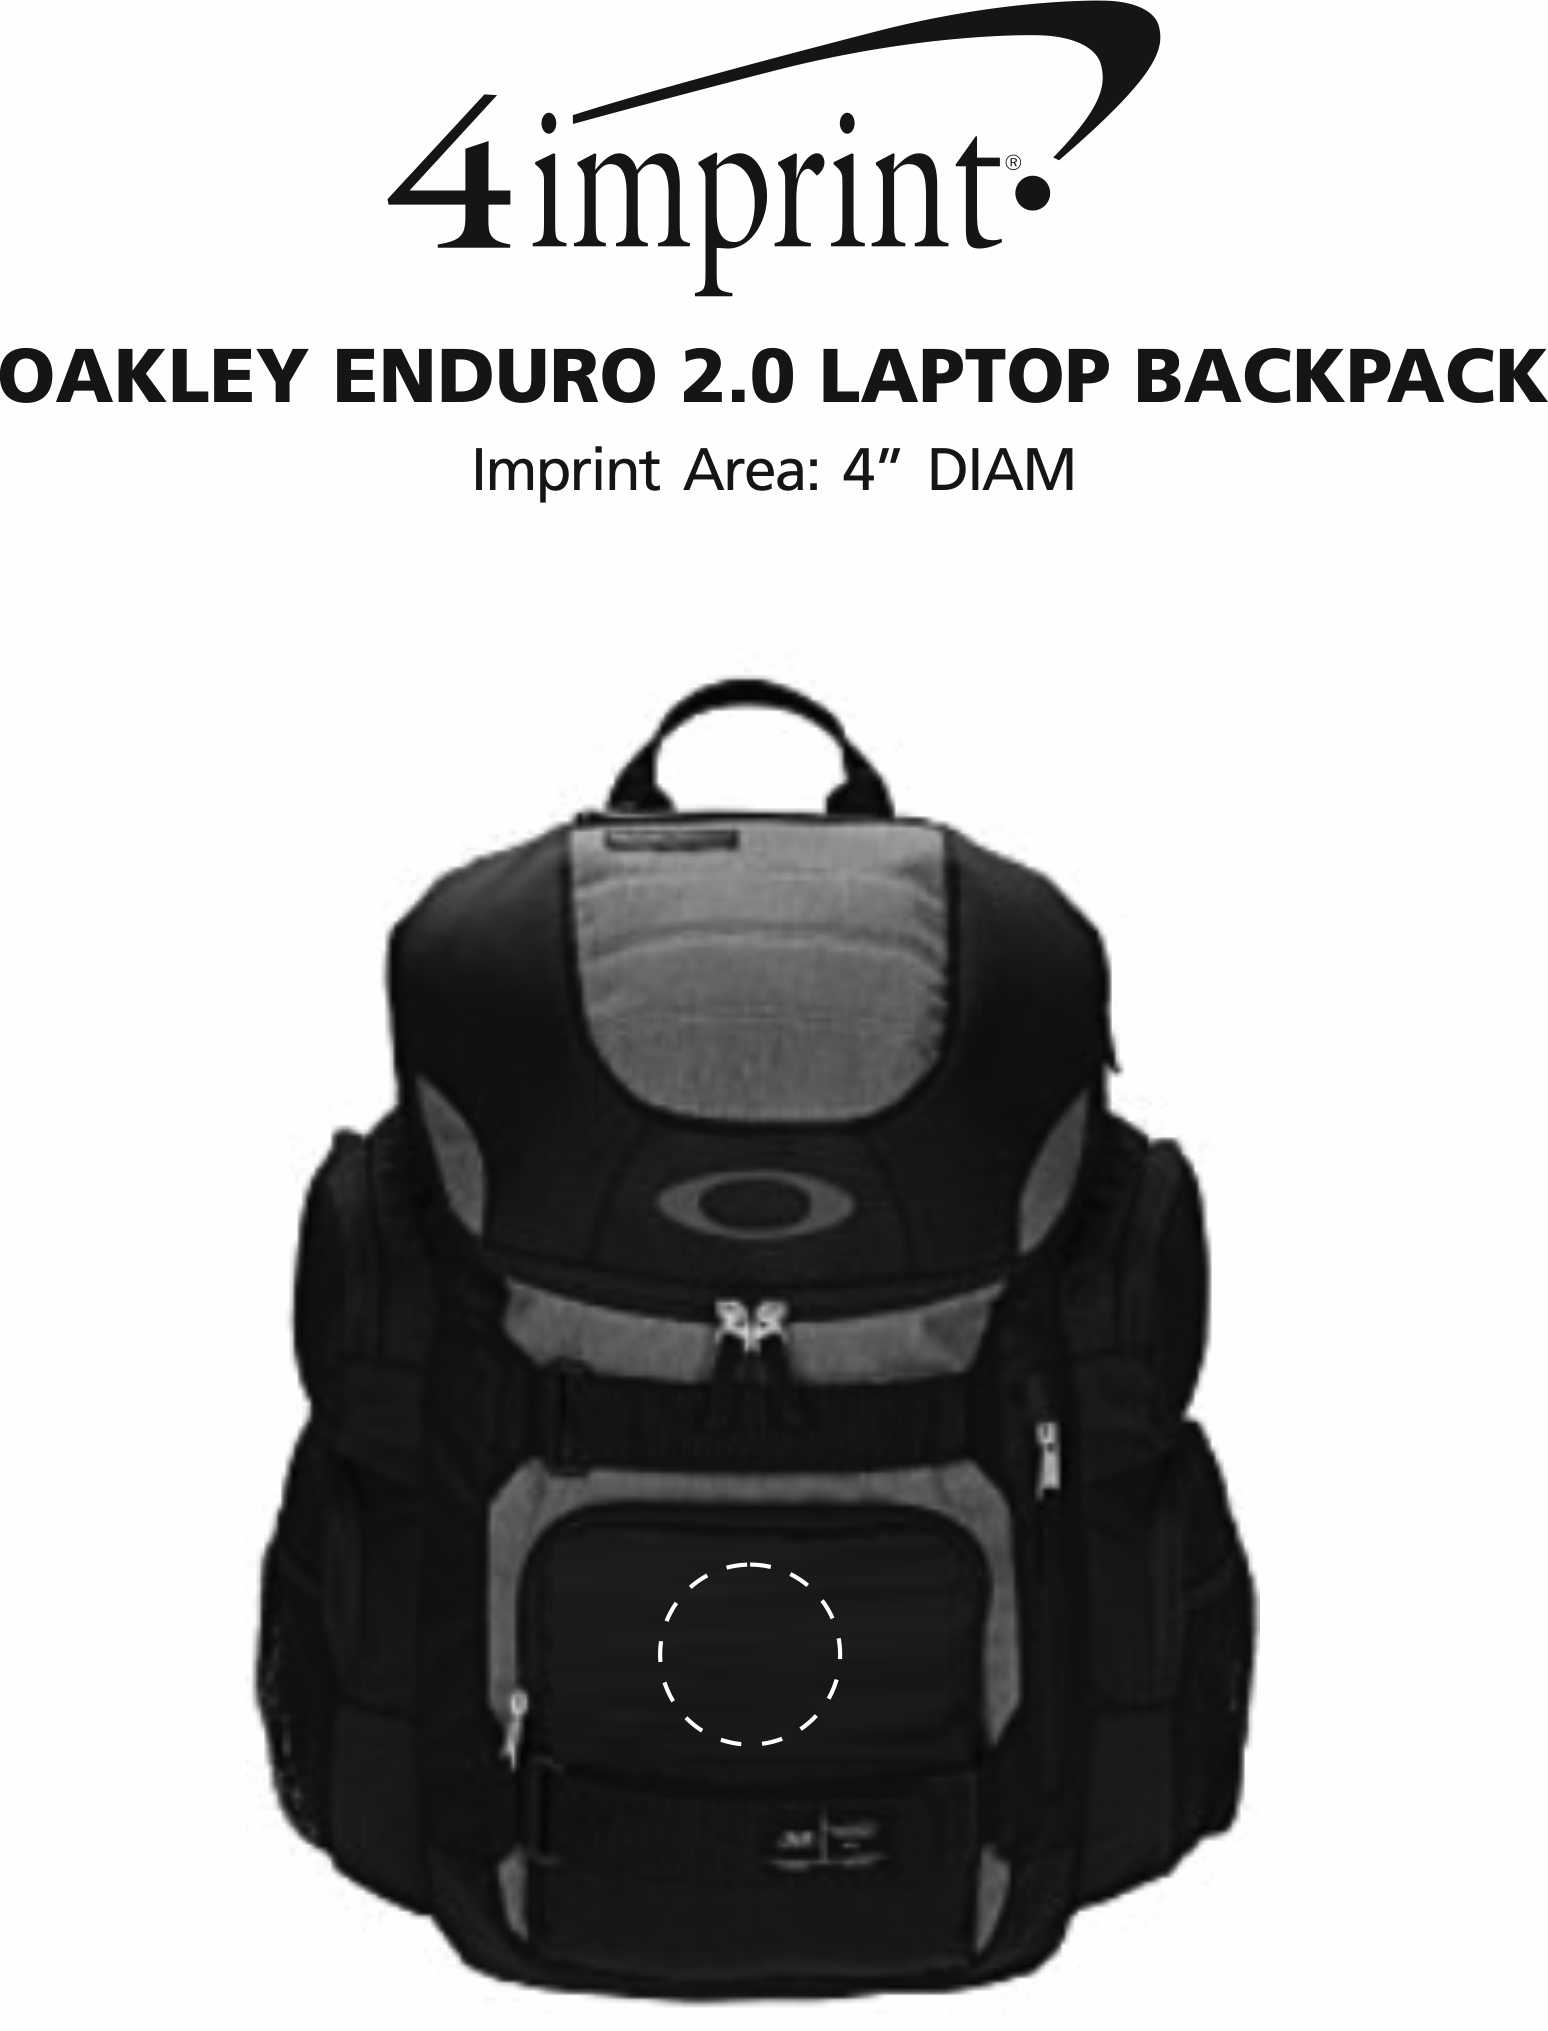 Imprint Area of Oakley Enduro 2.0 Laptop Backpack